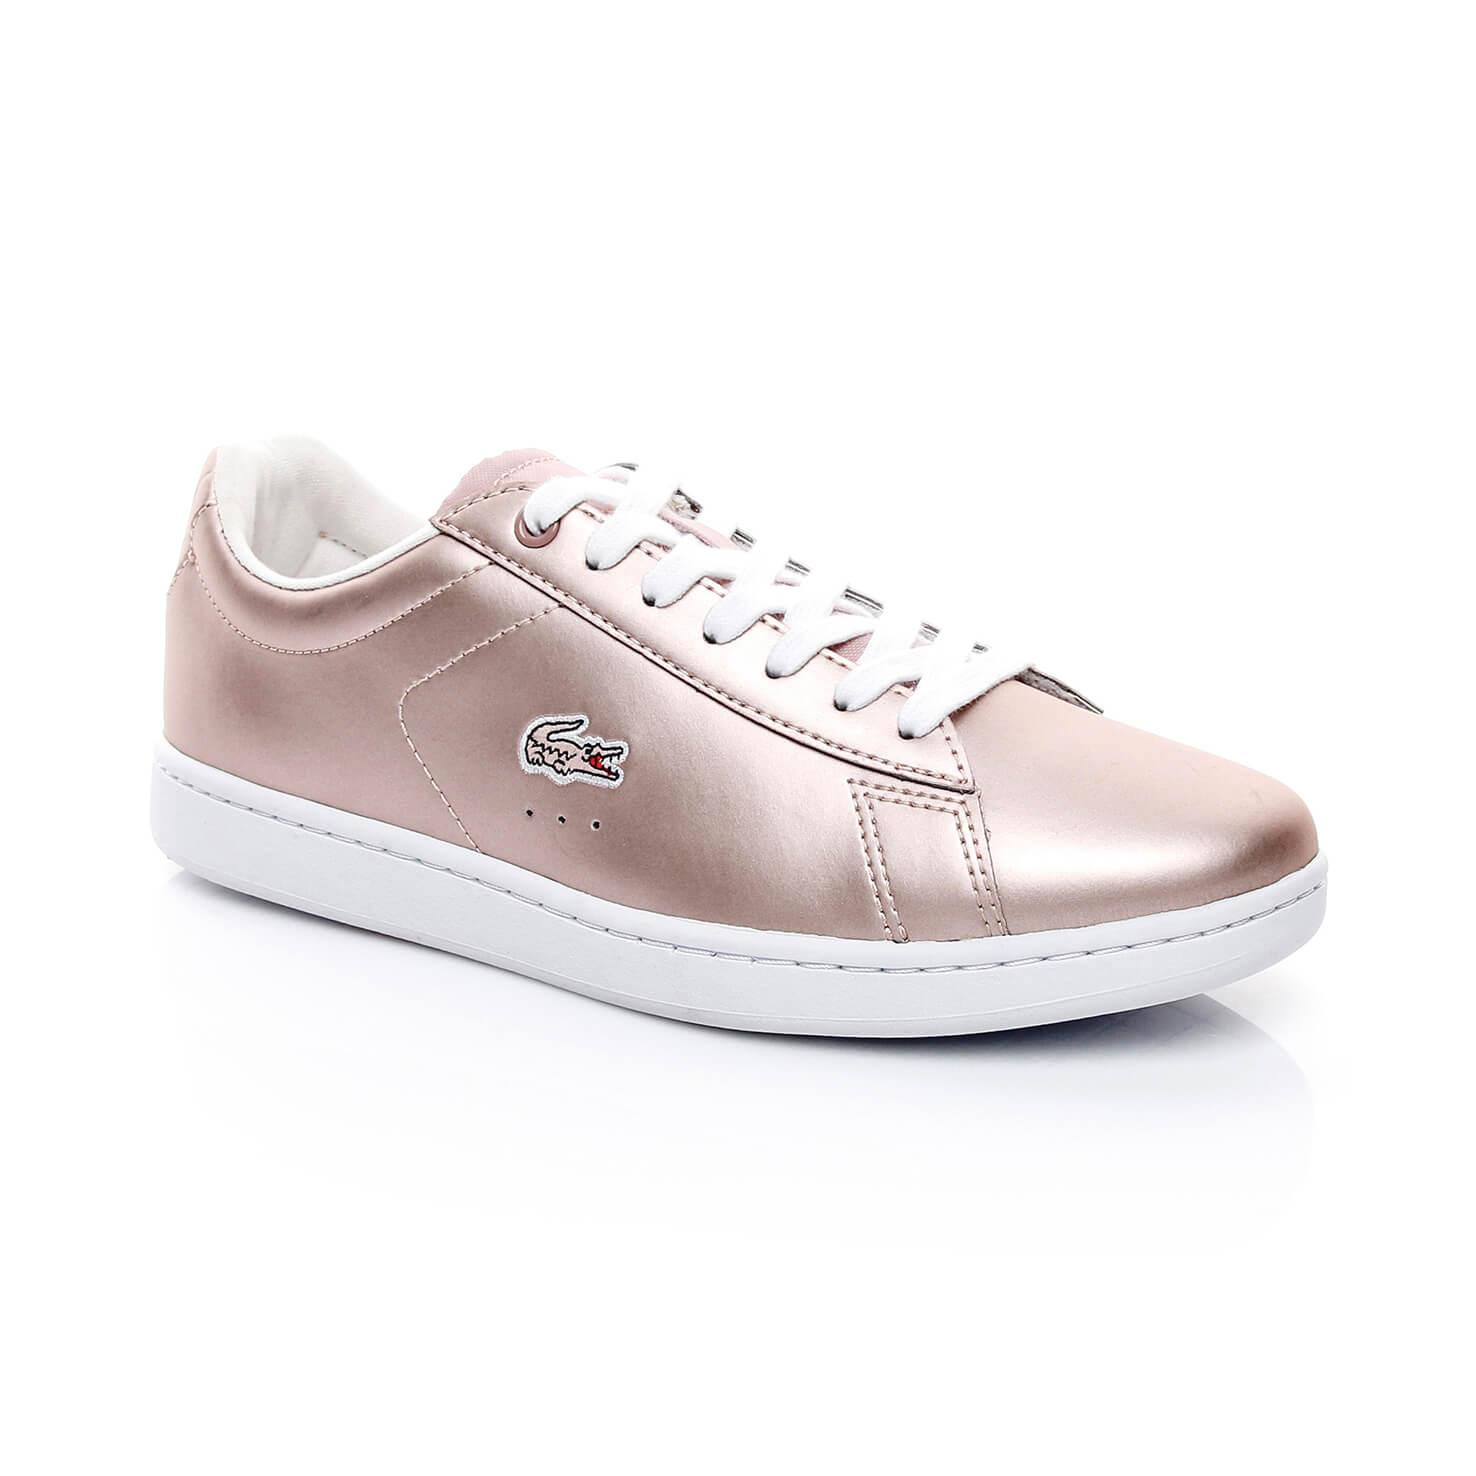 low priced 62f84 2bf35 Lacoste Carnaby Evo Kadın Pembe Sneaker